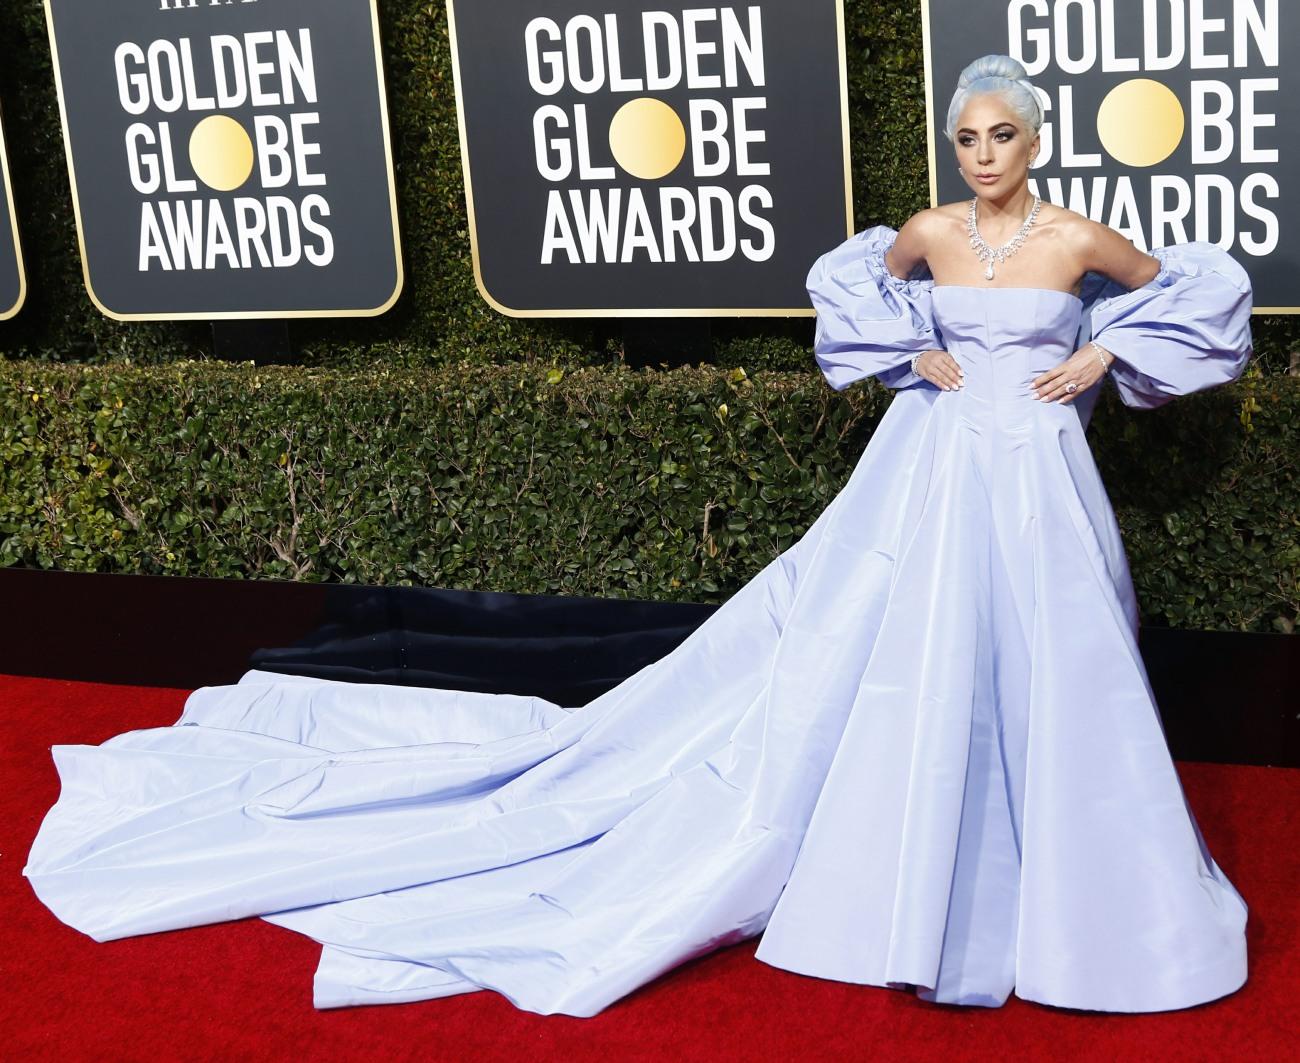 76th Golden Globe Awards Arrivals